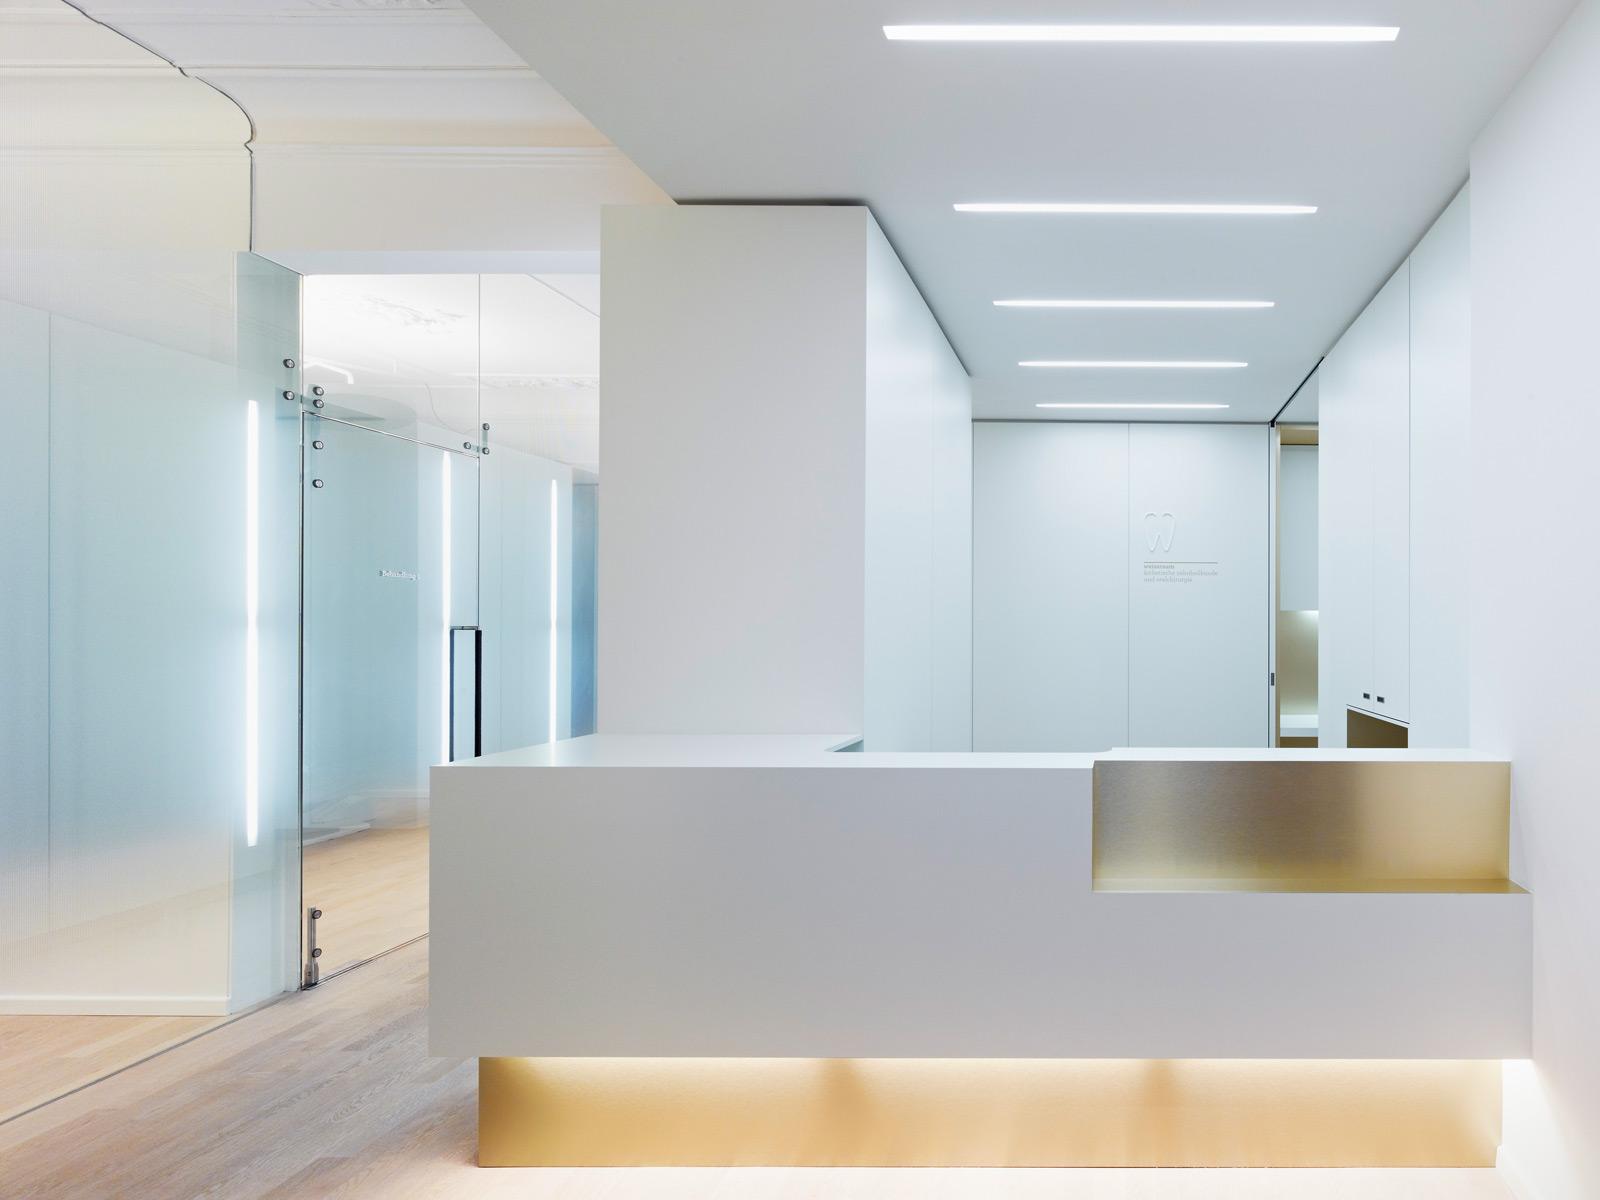 best architects architektur award ippolito fleitz group. Black Bedroom Furniture Sets. Home Design Ideas